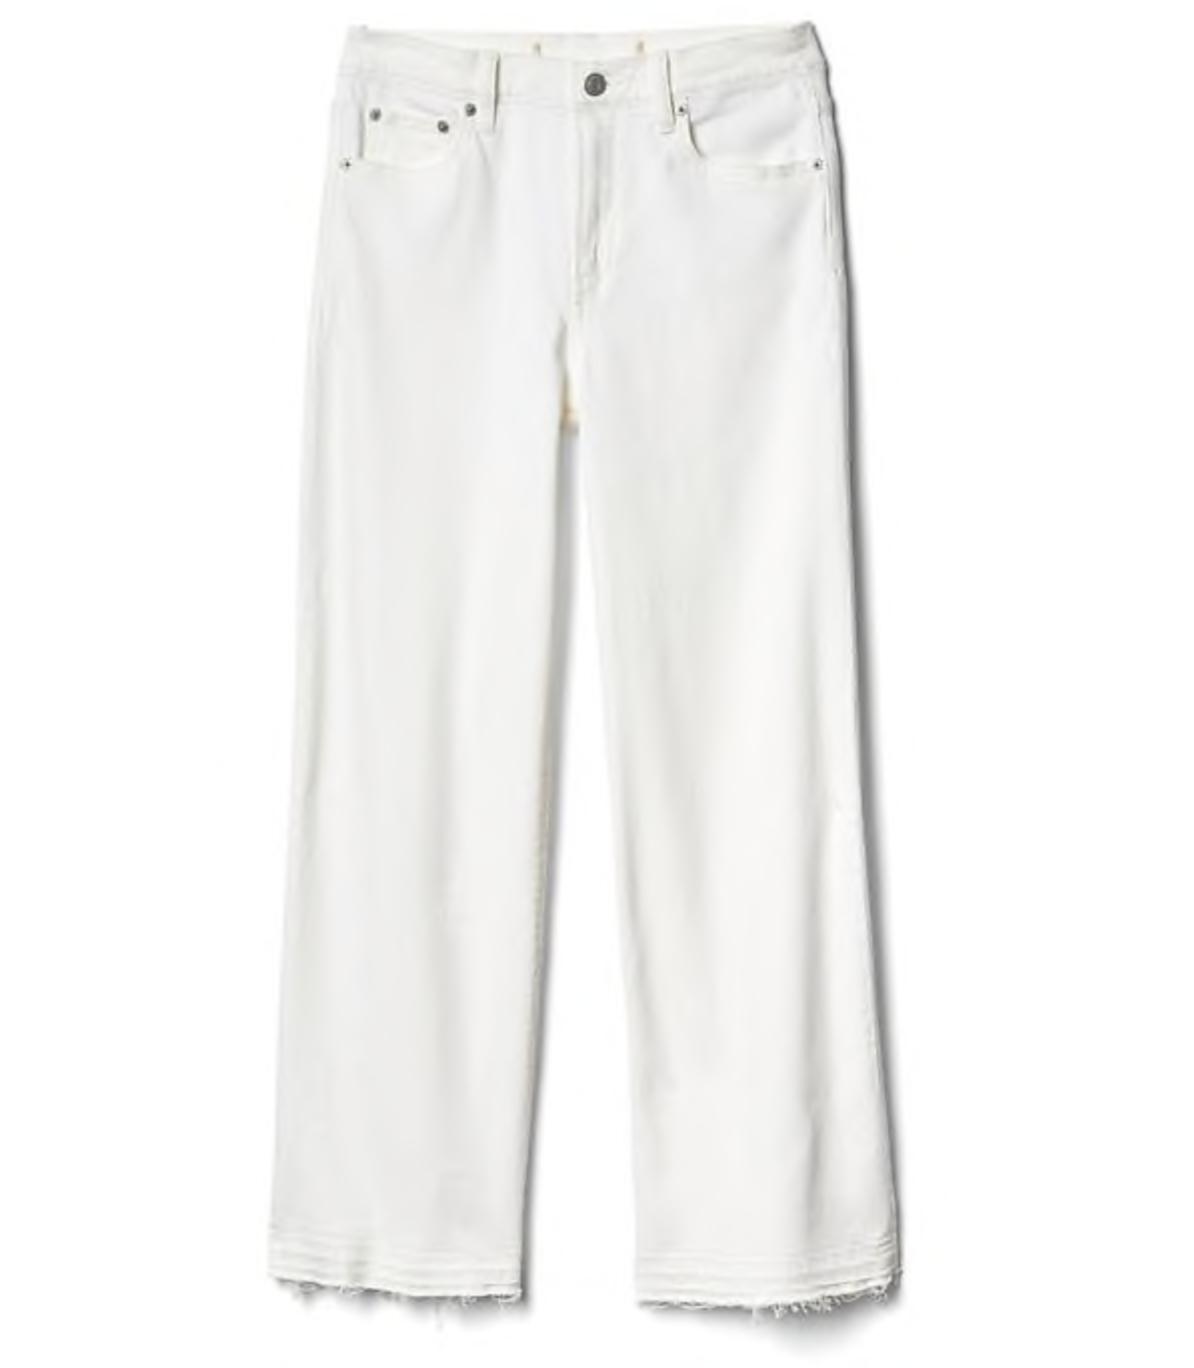 Gap White Jeans, $70